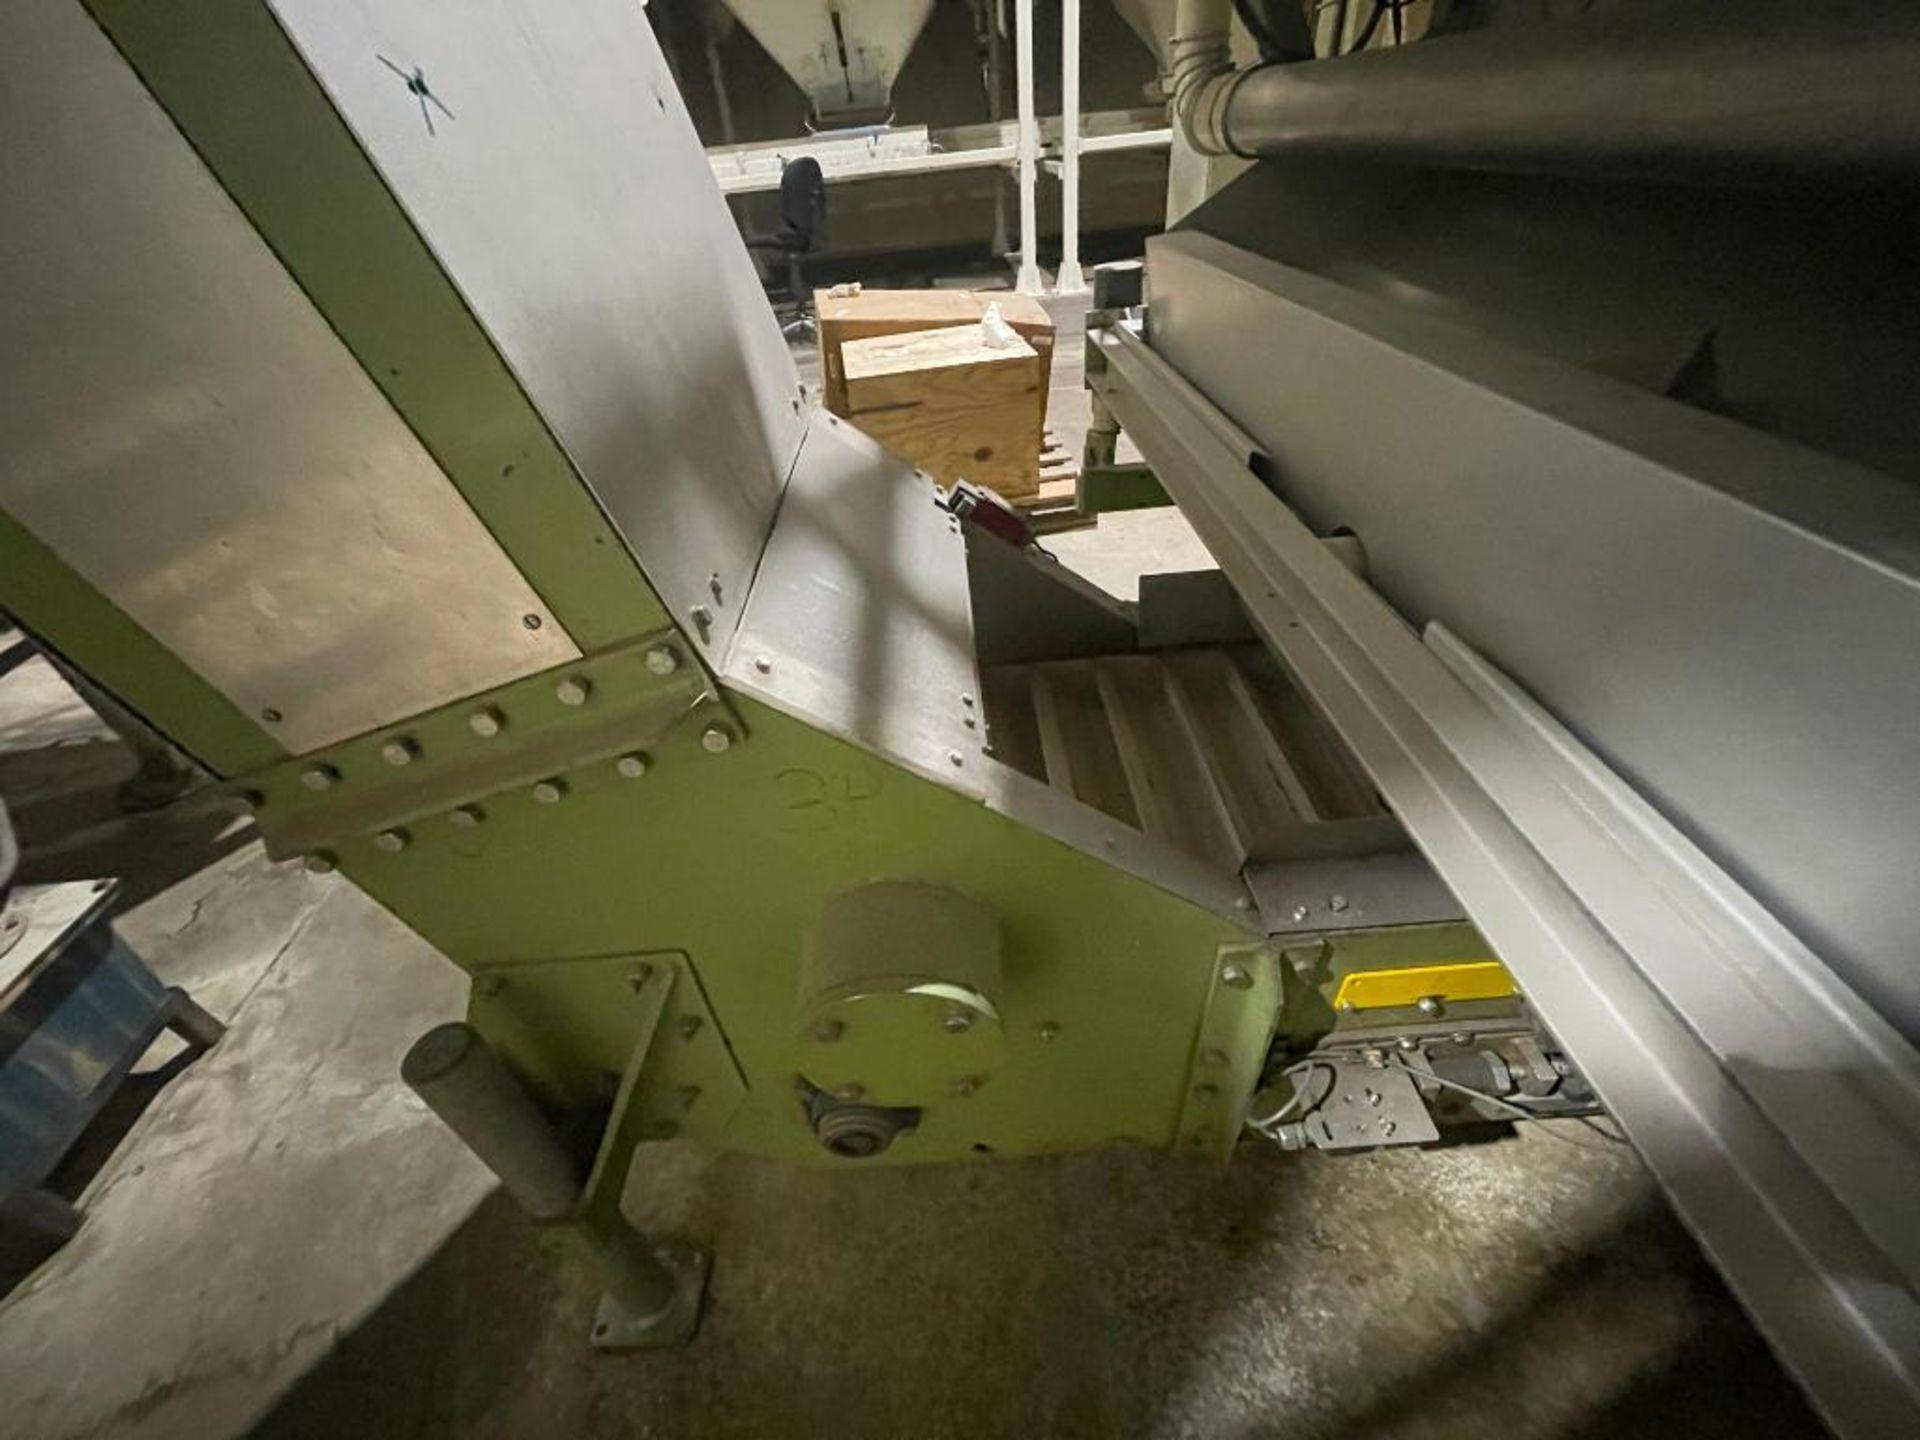 mild steel incline overlapping bucket conveyor - Image 5 of 14